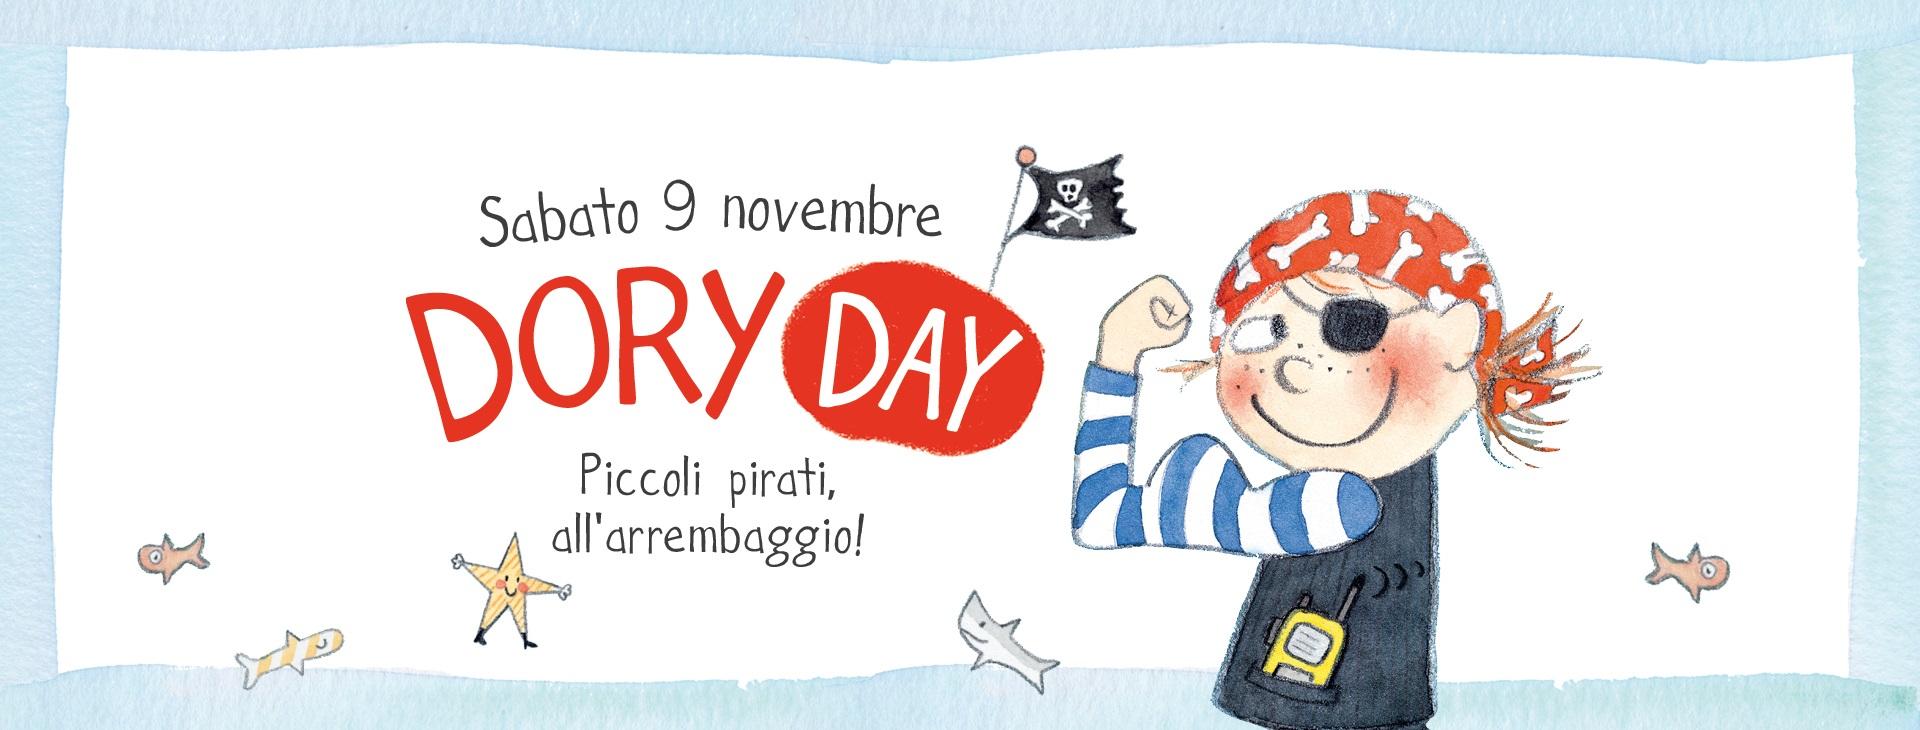 Dory Fantasmagorica Day